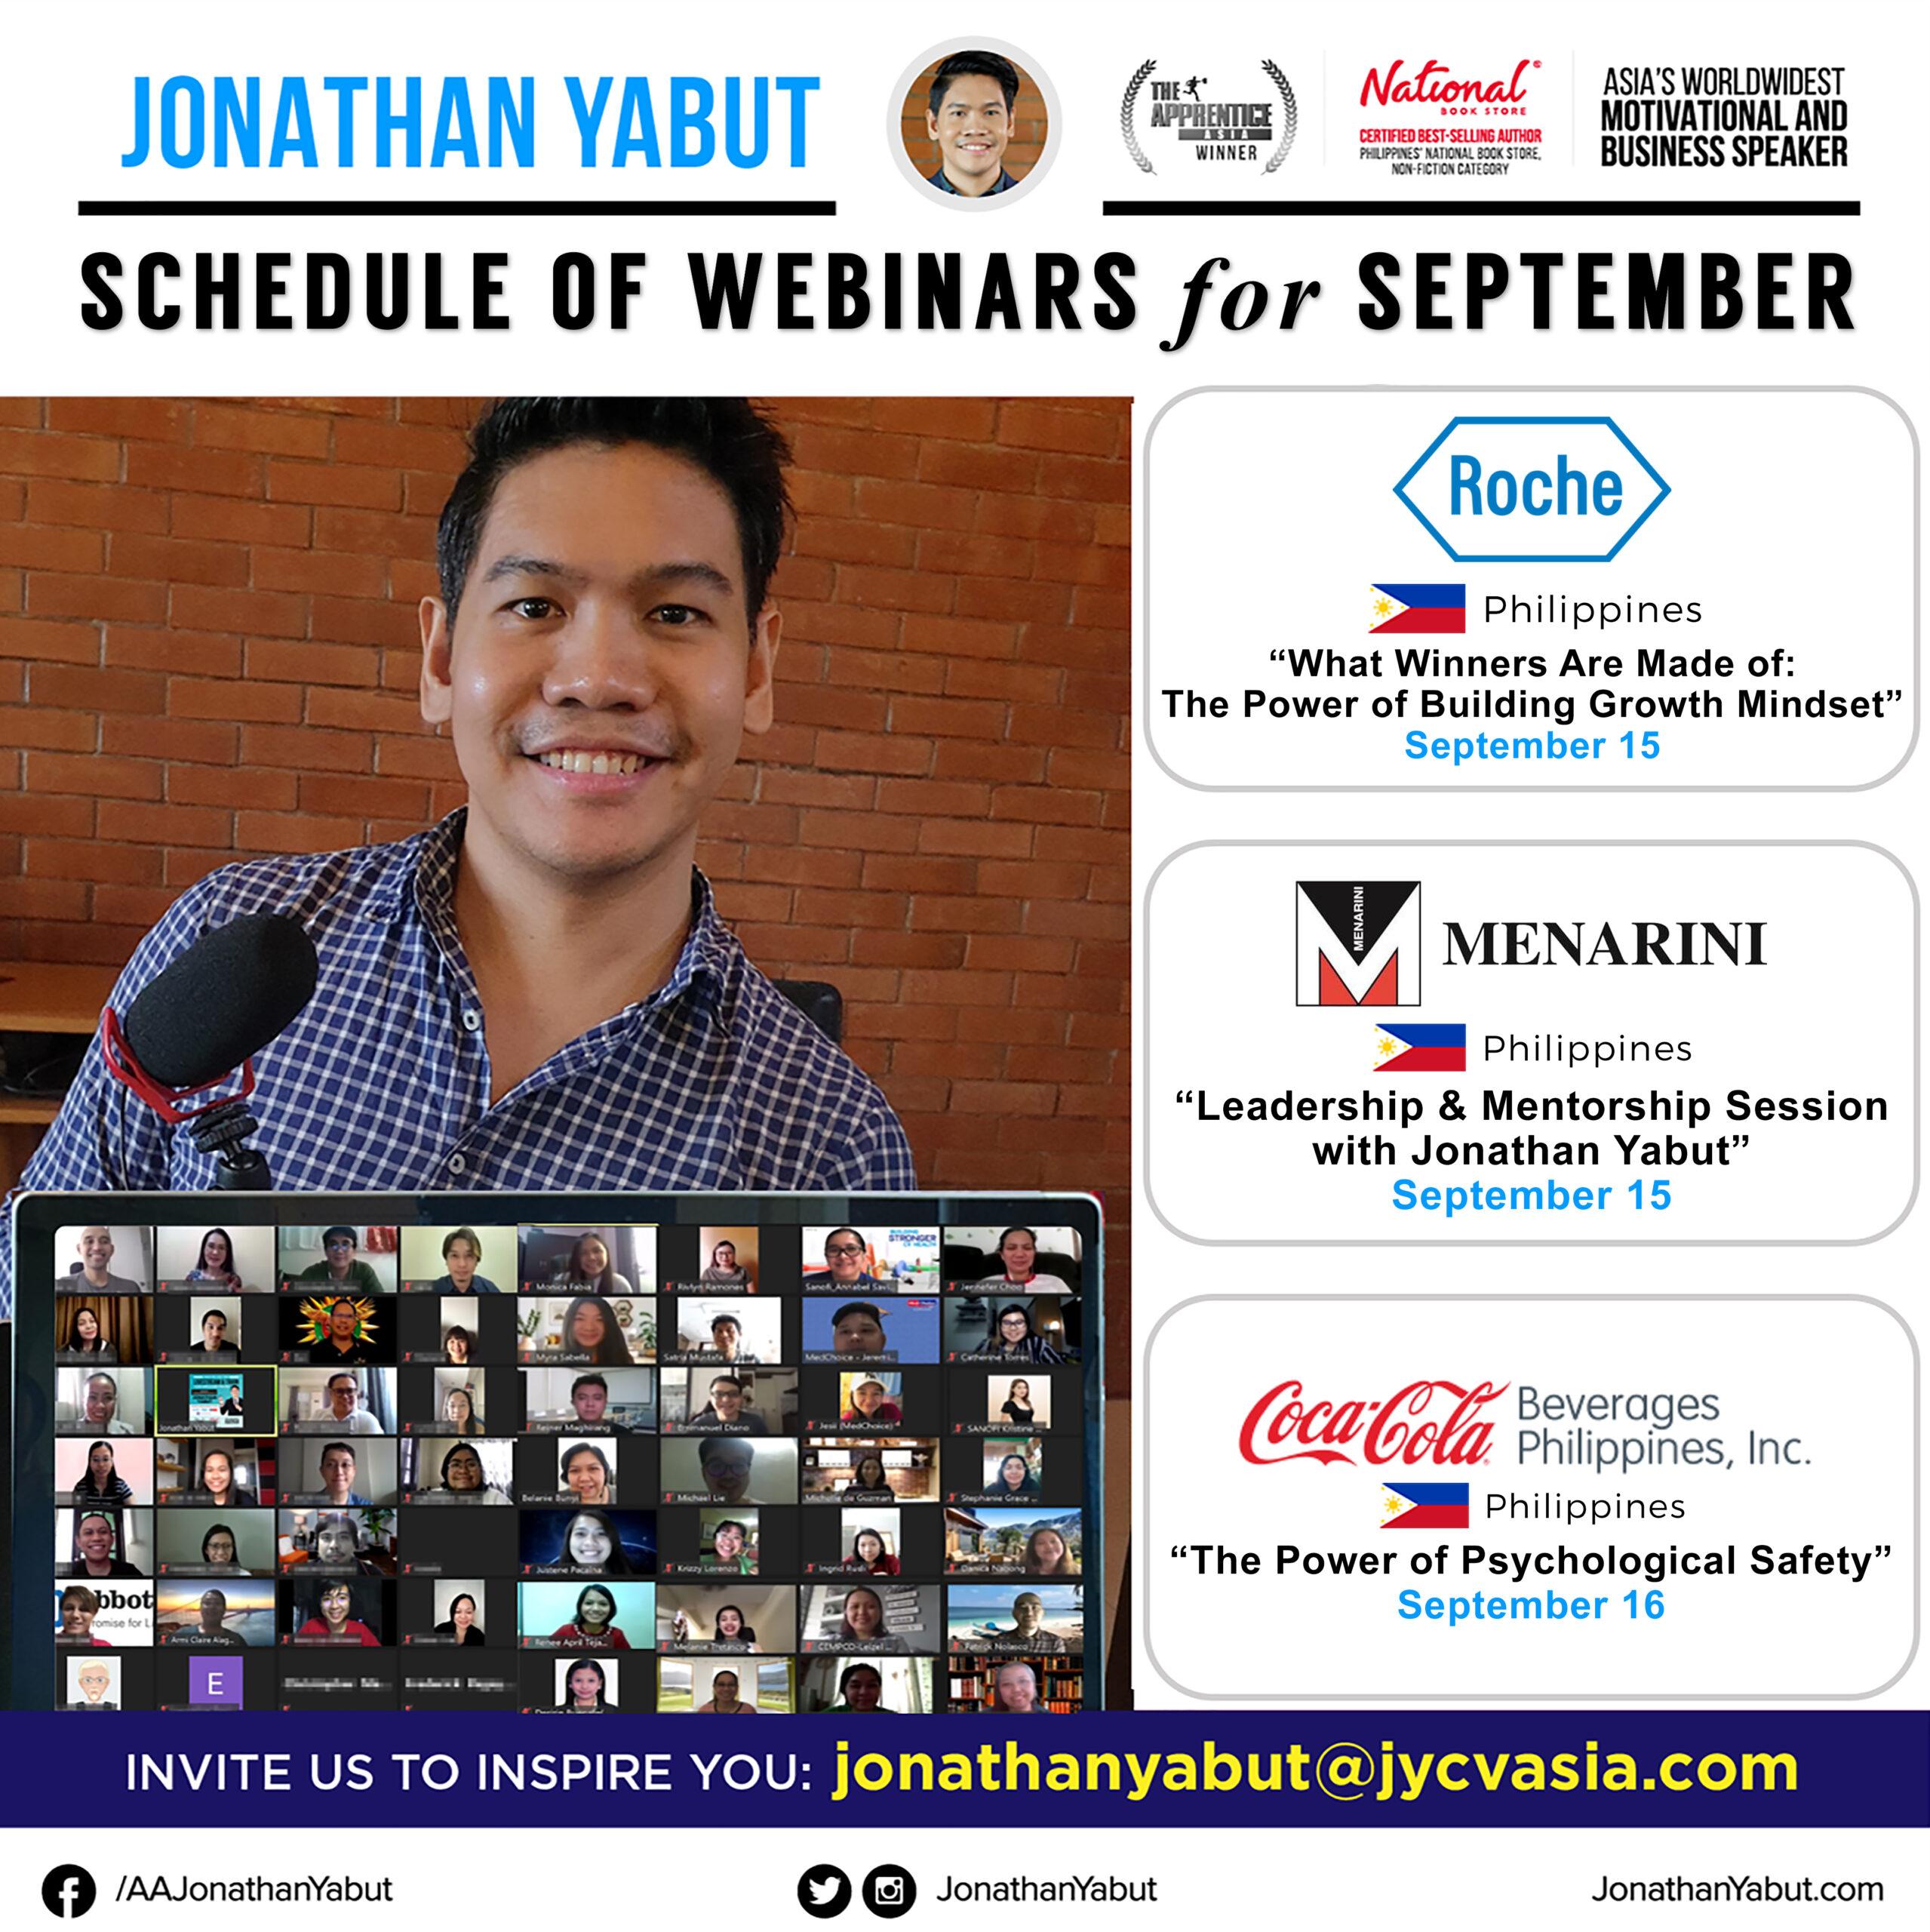 Jonathan Yabut motivational speaker asia philippines September webinars 2 IG Feed